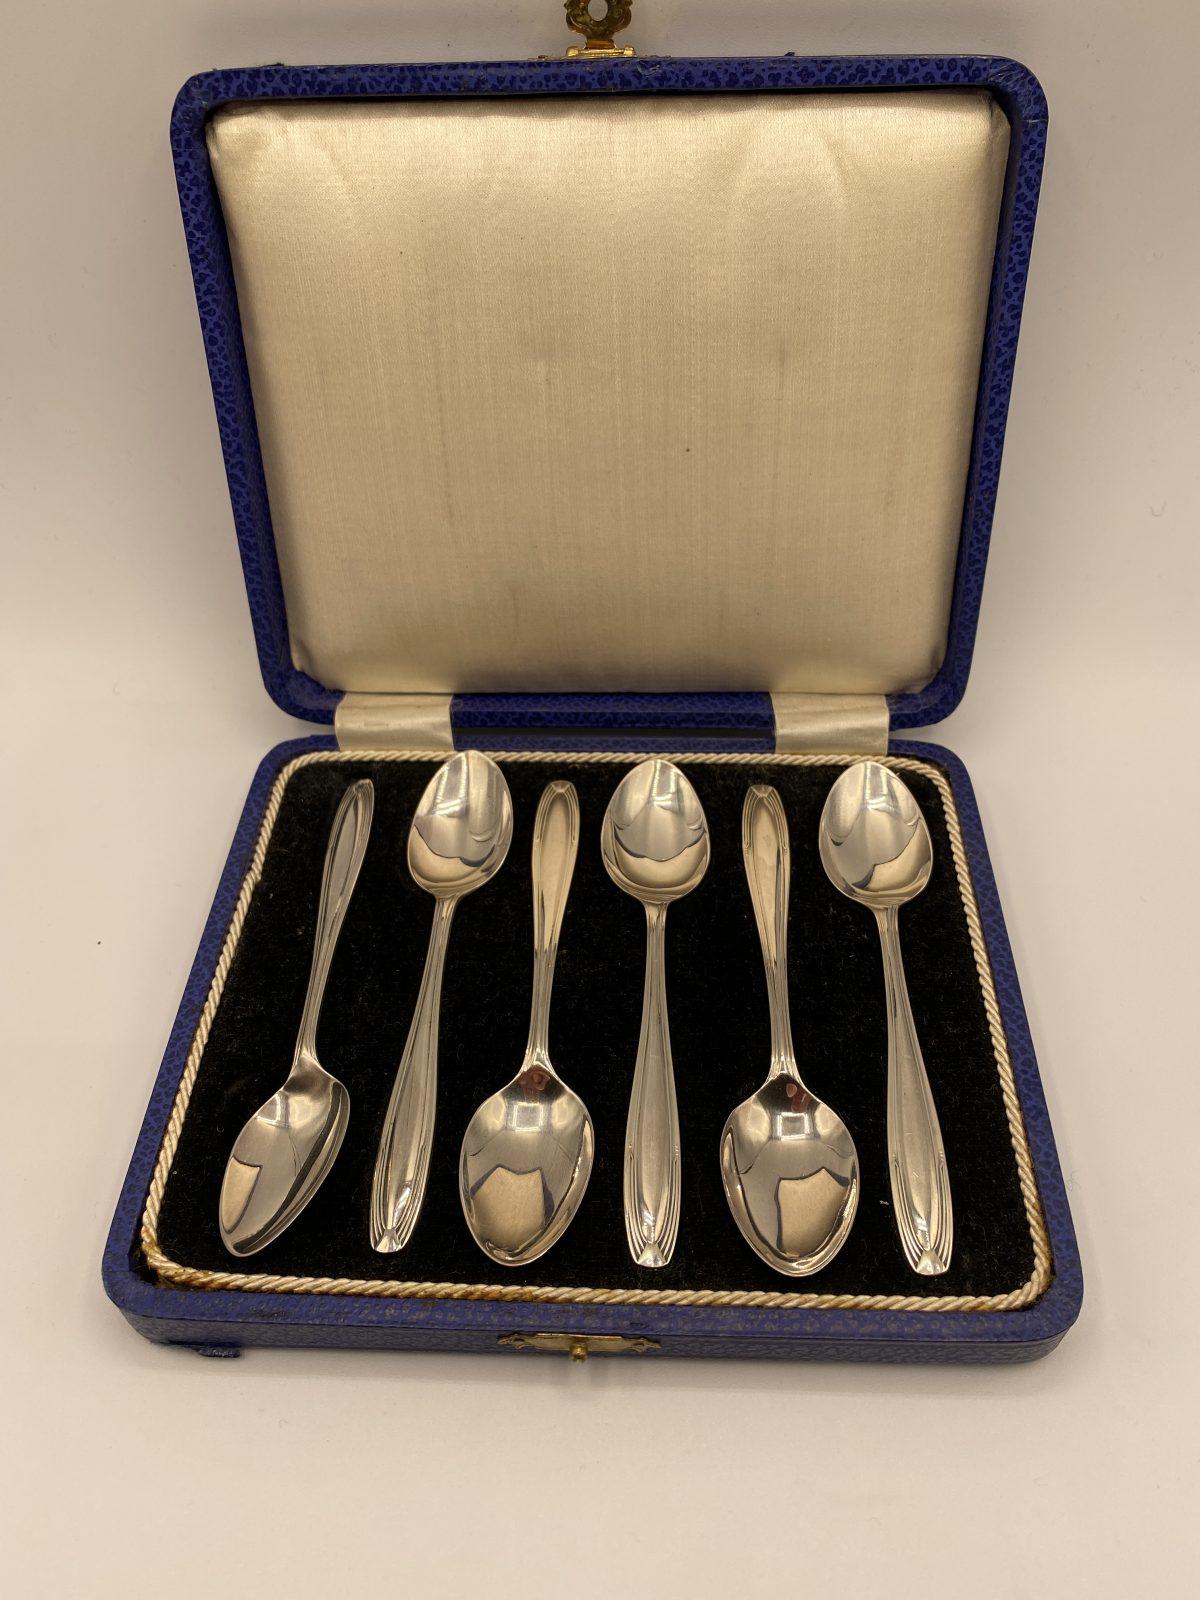 G3 - A Boxed Set of 6 Art Deco Silver Spoons, Birmingham 1930.  £76